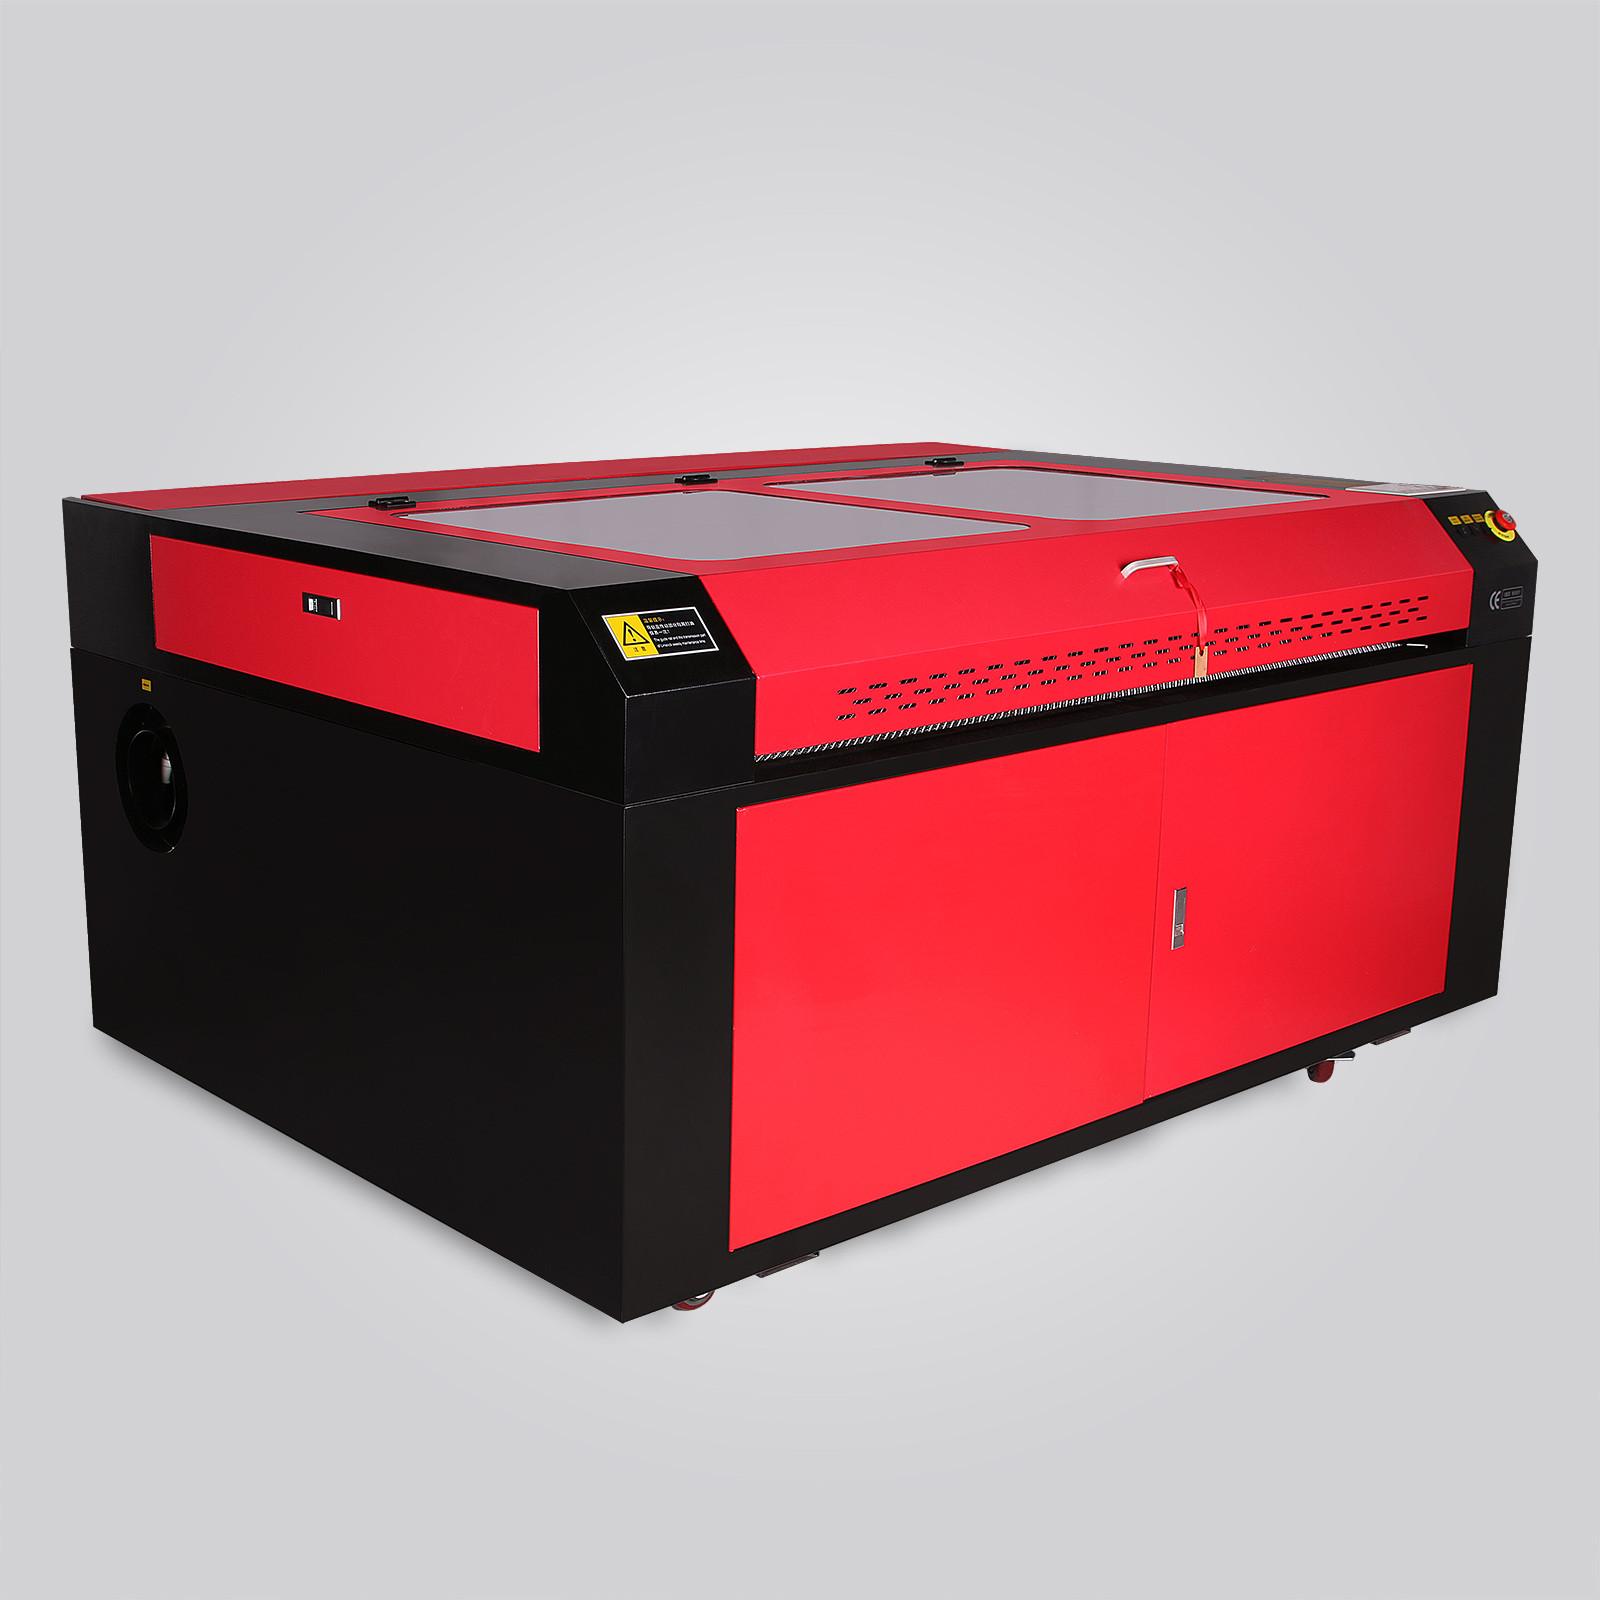 Macchina-per-Incisione-Laser-CO2-40-130W-Asse-Rotante-Tagliatrice-Incisore miniatura 74